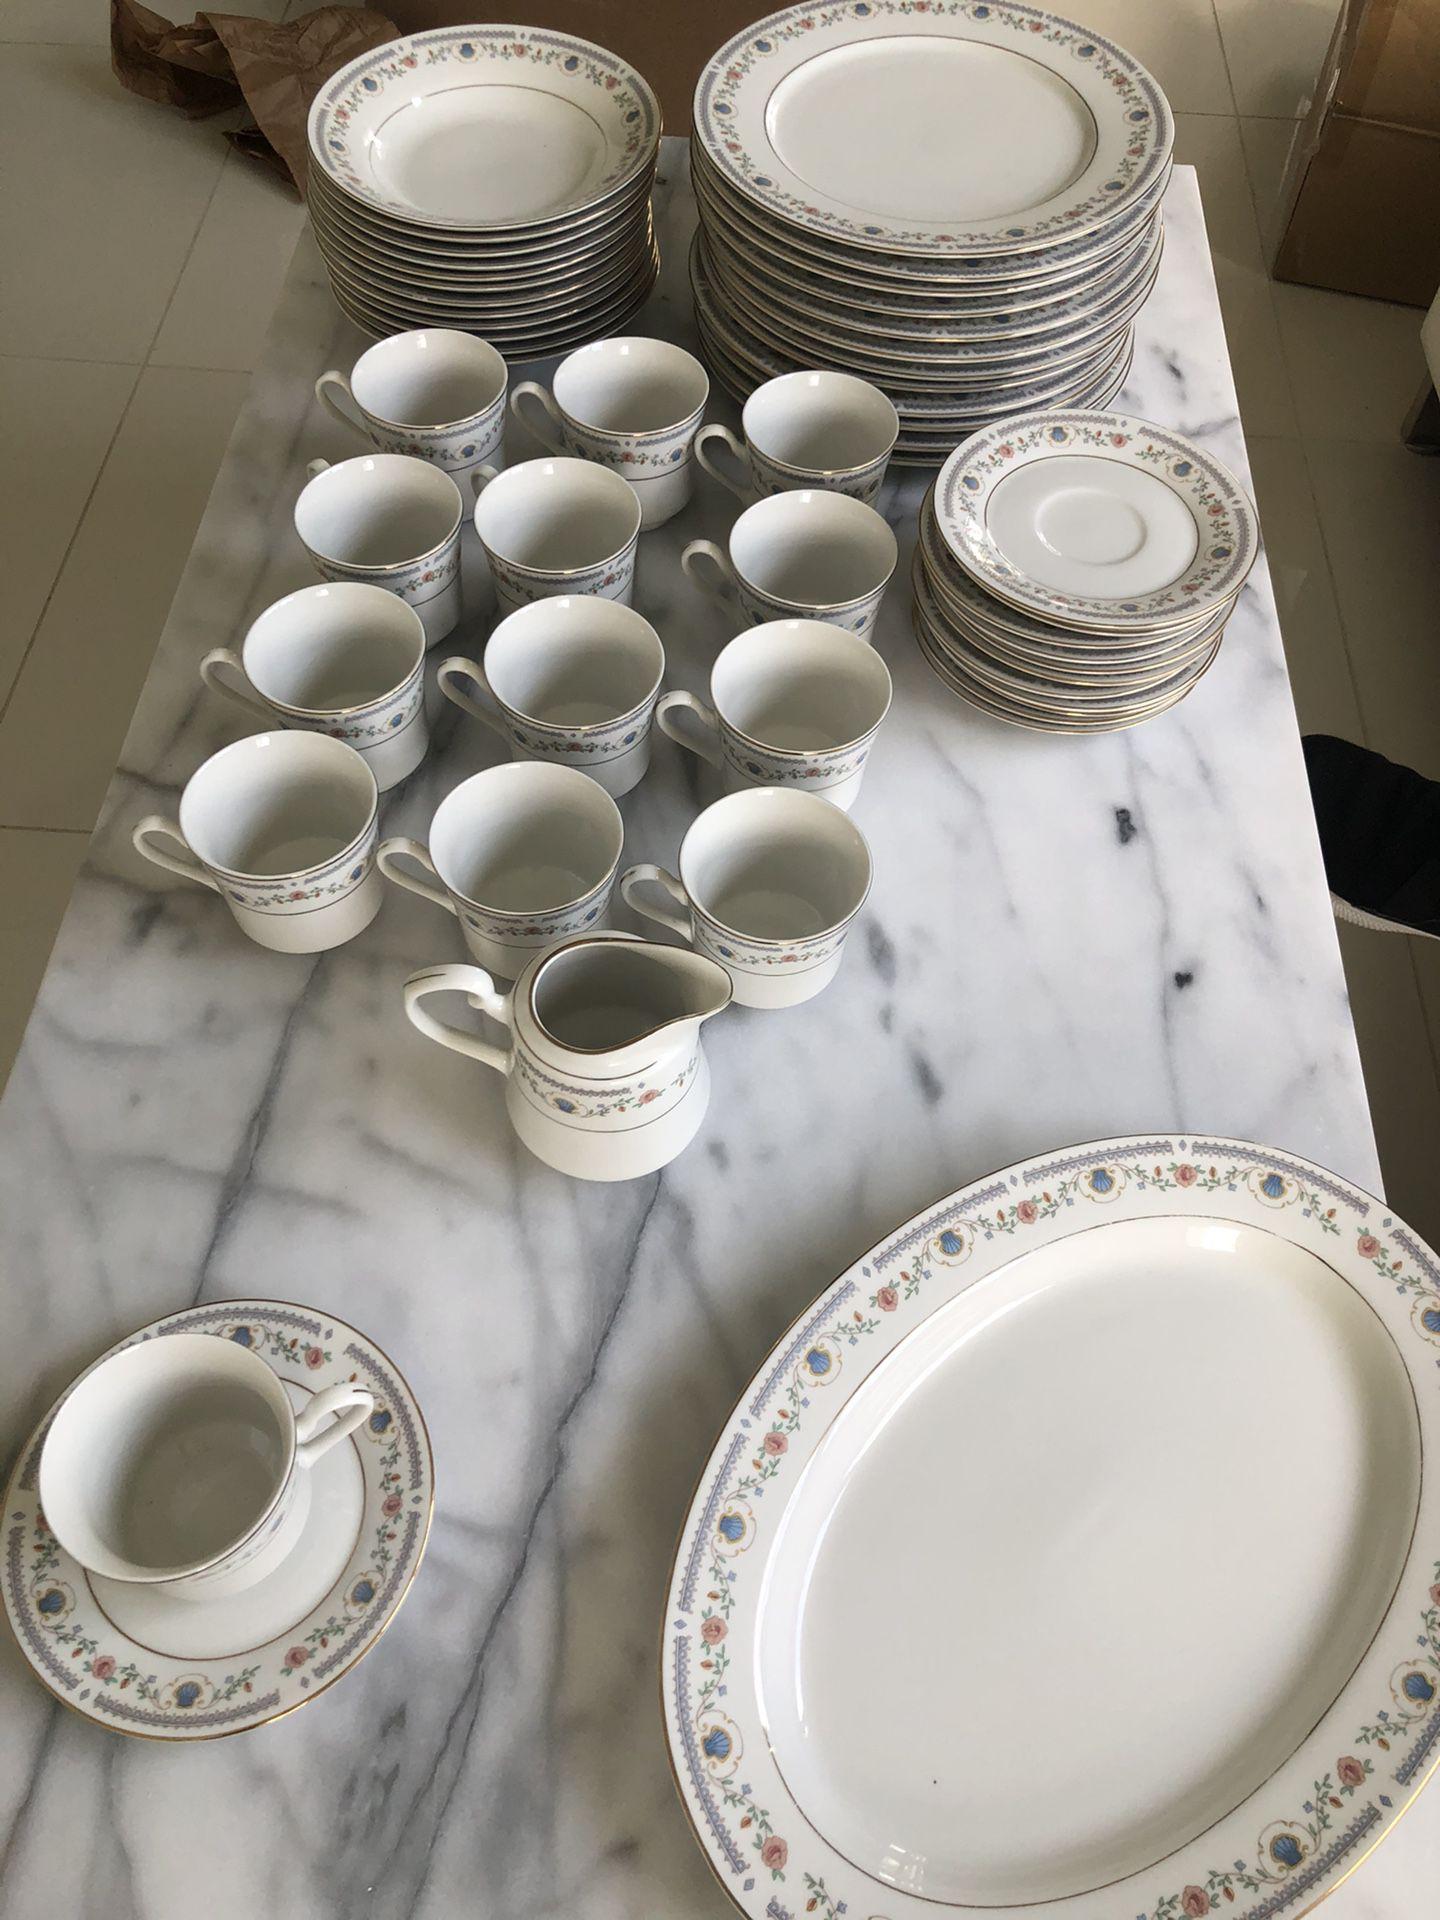 Tívoli China Dinnerware Ser #8305 (12 Person Set)